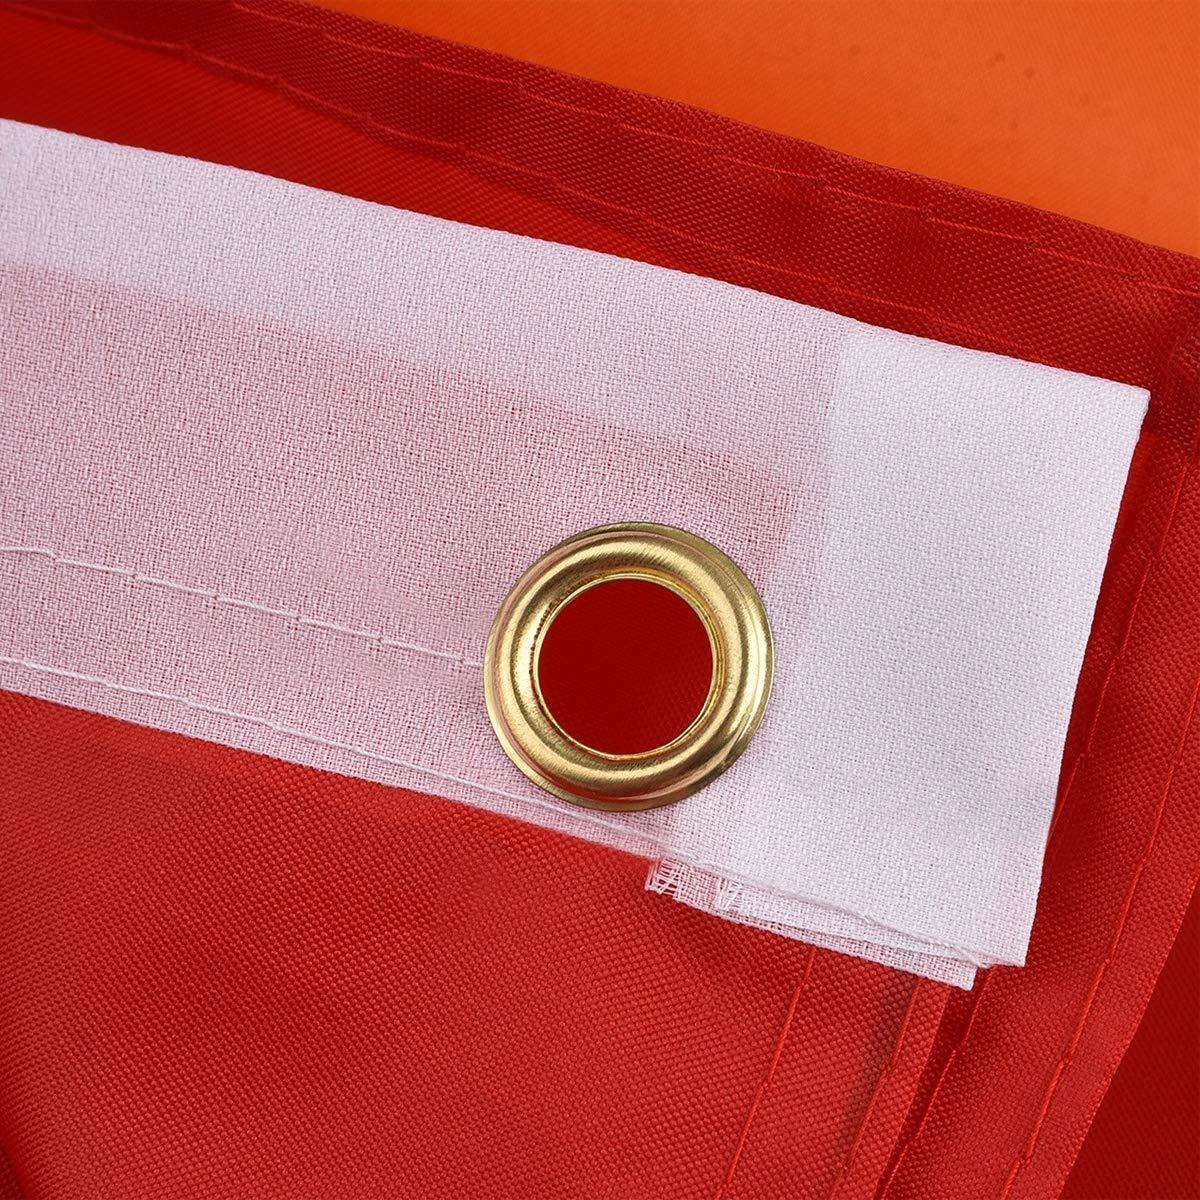 lot QWERTB Cremallera Color vibrante 15-40cm 3# Resina color del contraste del cremallera de la manera anillo de tiro de cremallera cabeza DIY trabajo hecho a mano bolsa Primer Fin 10Pcs